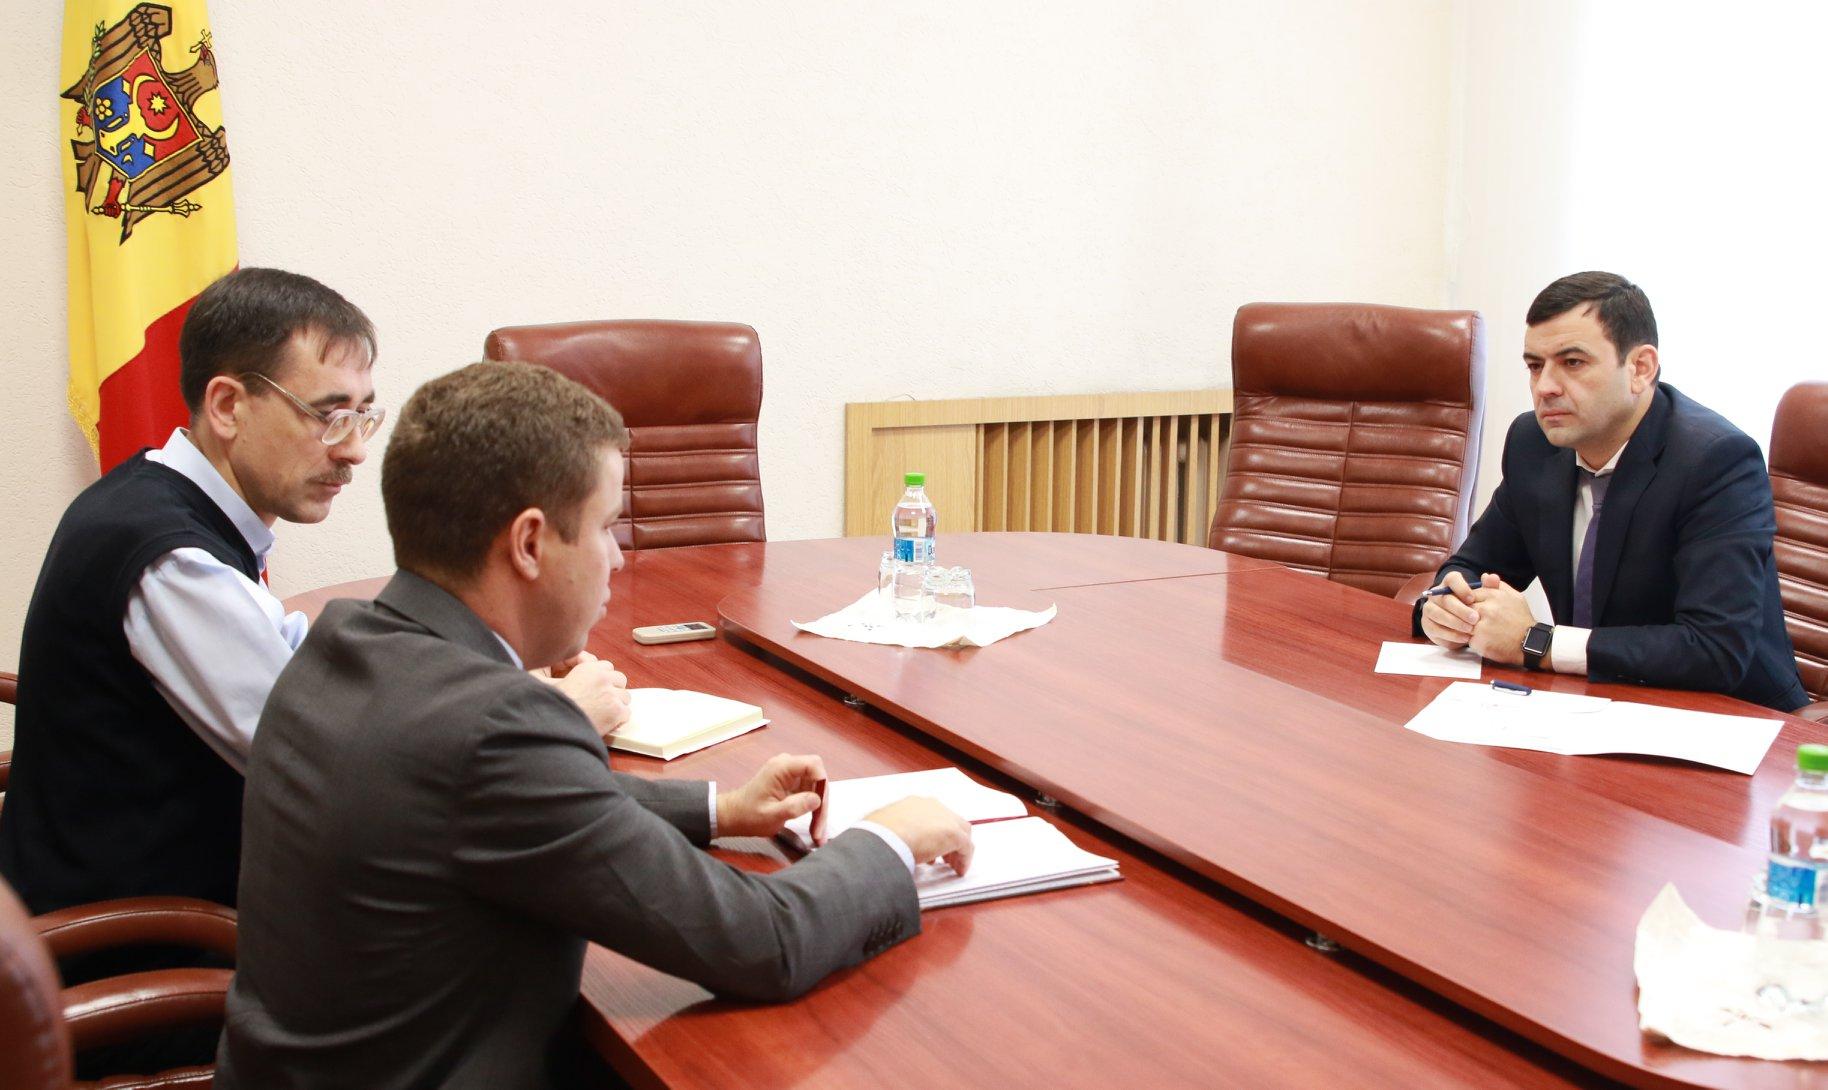 delegatia fmi moldova, chiril gaburici ministru, ministerul infrastucturii si economiei